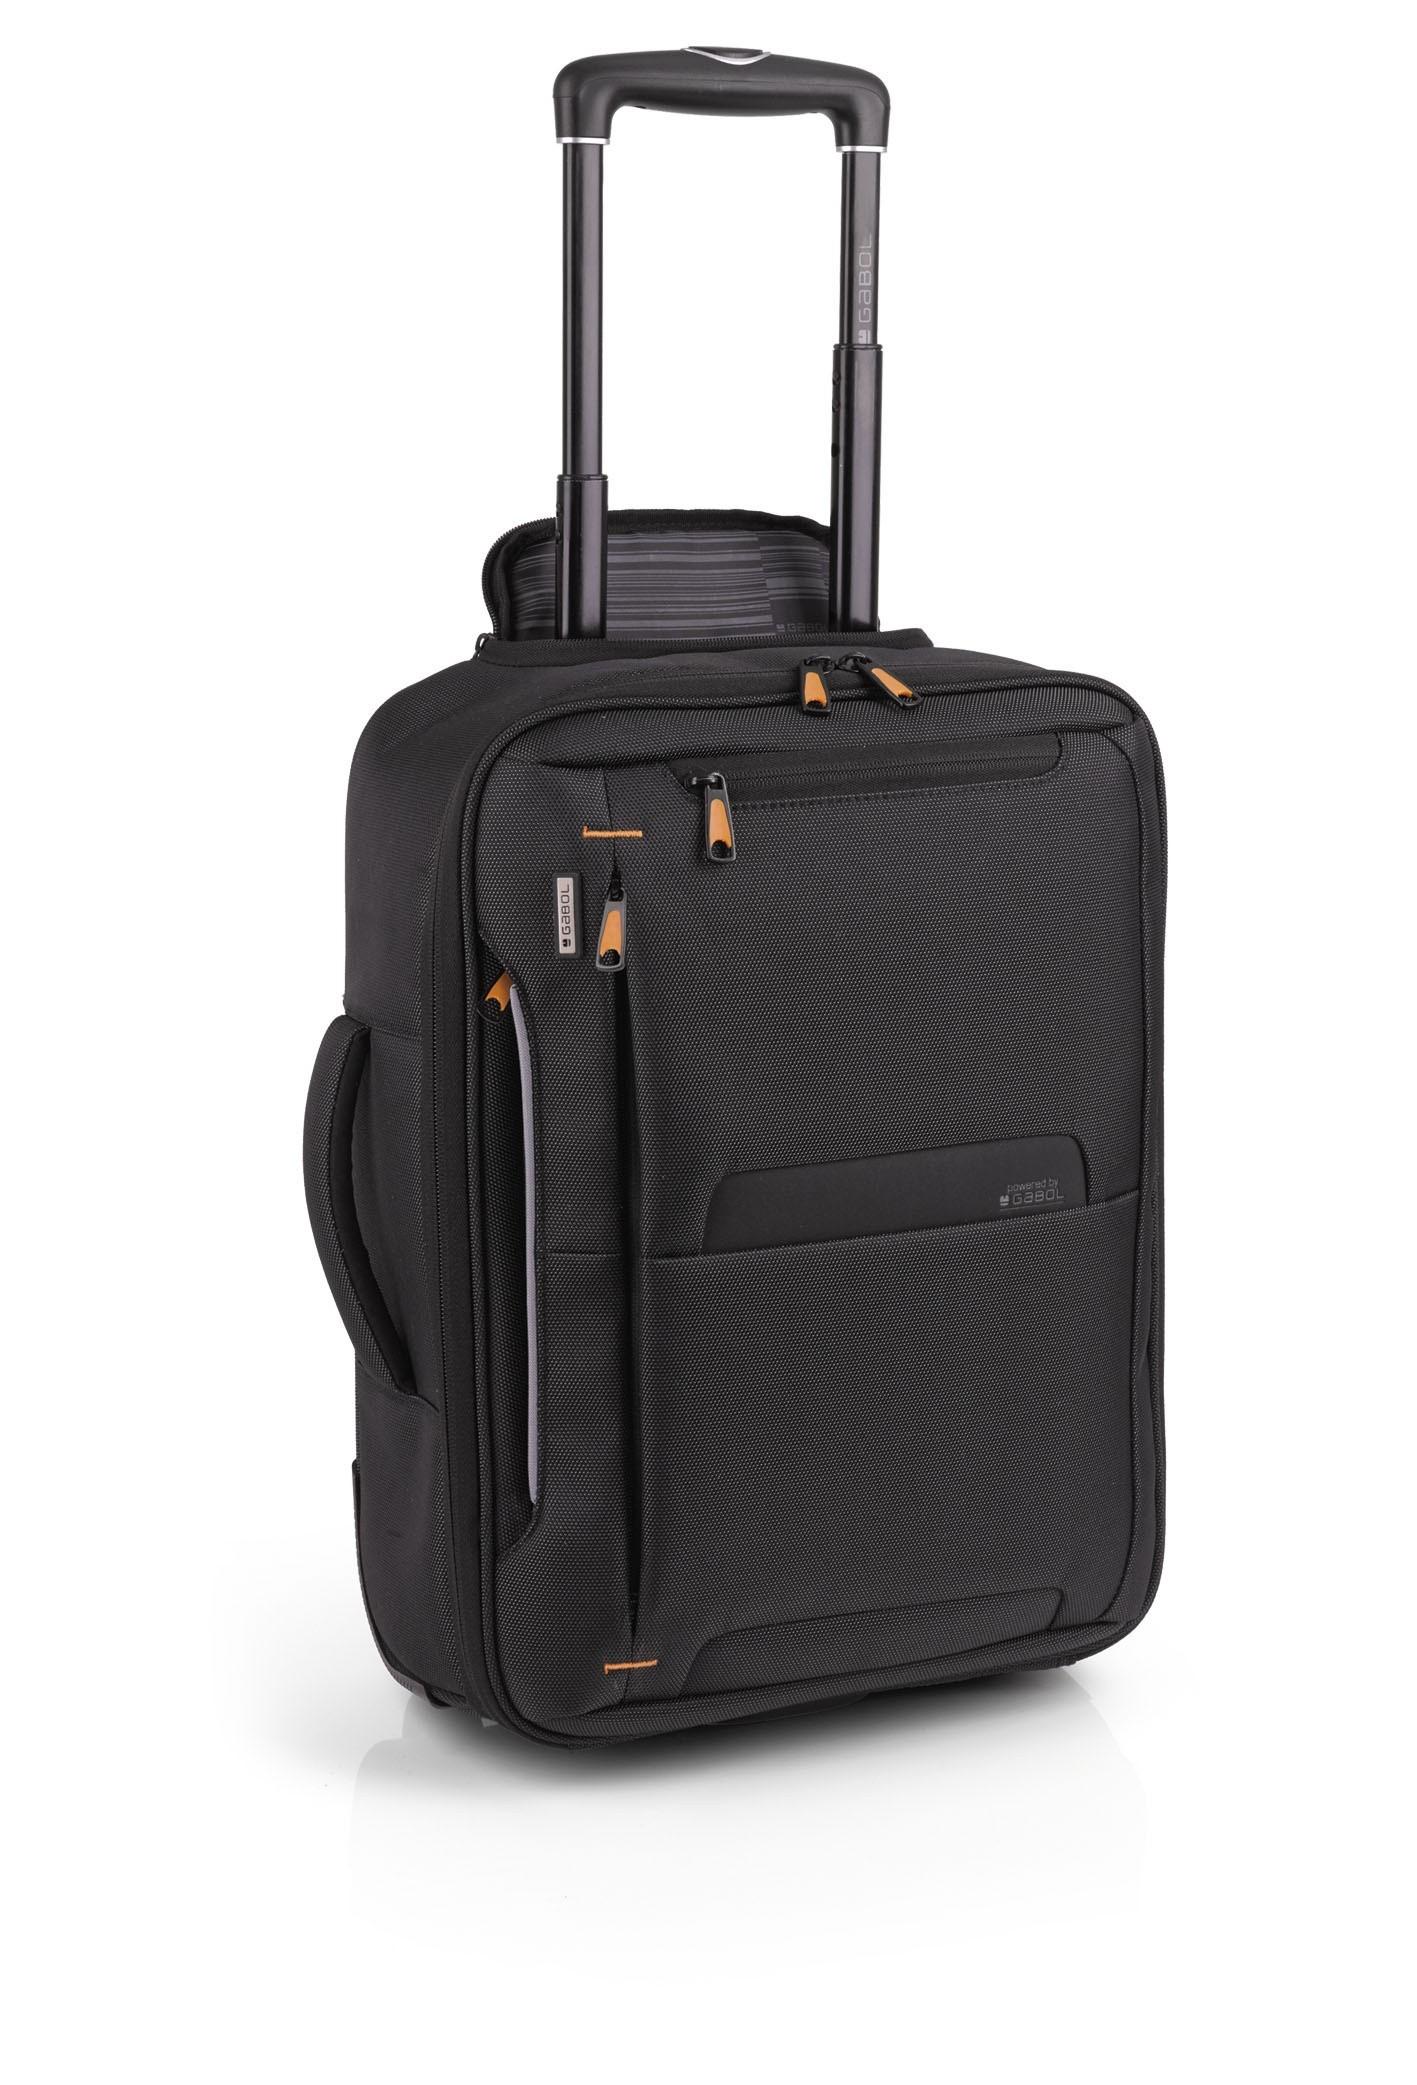 Gabol Pilotos Business Rugtas/Trolley 15.6 inch 404312 Black